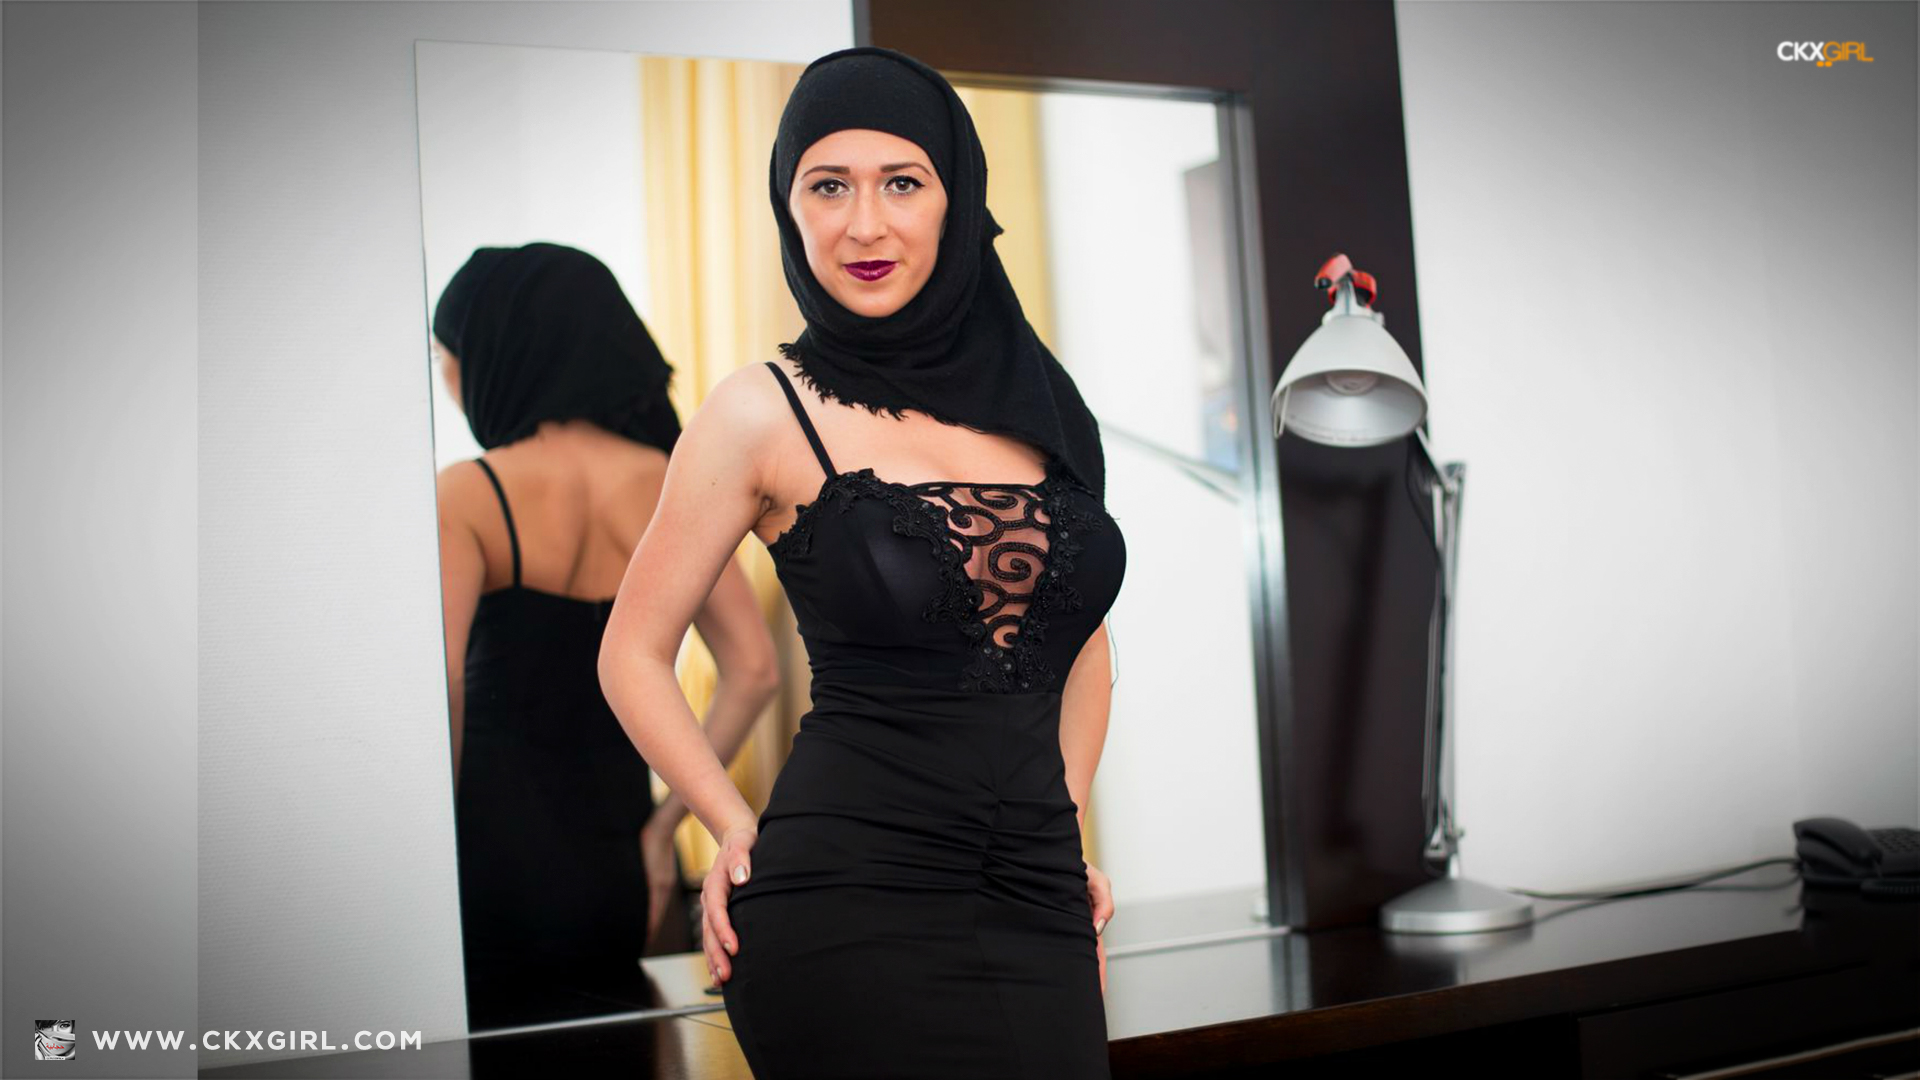 All Models  Cokegirlx  Muslim Hijab Girls  Live Sex Shows  Xxx  Cokegirlxcom-7179